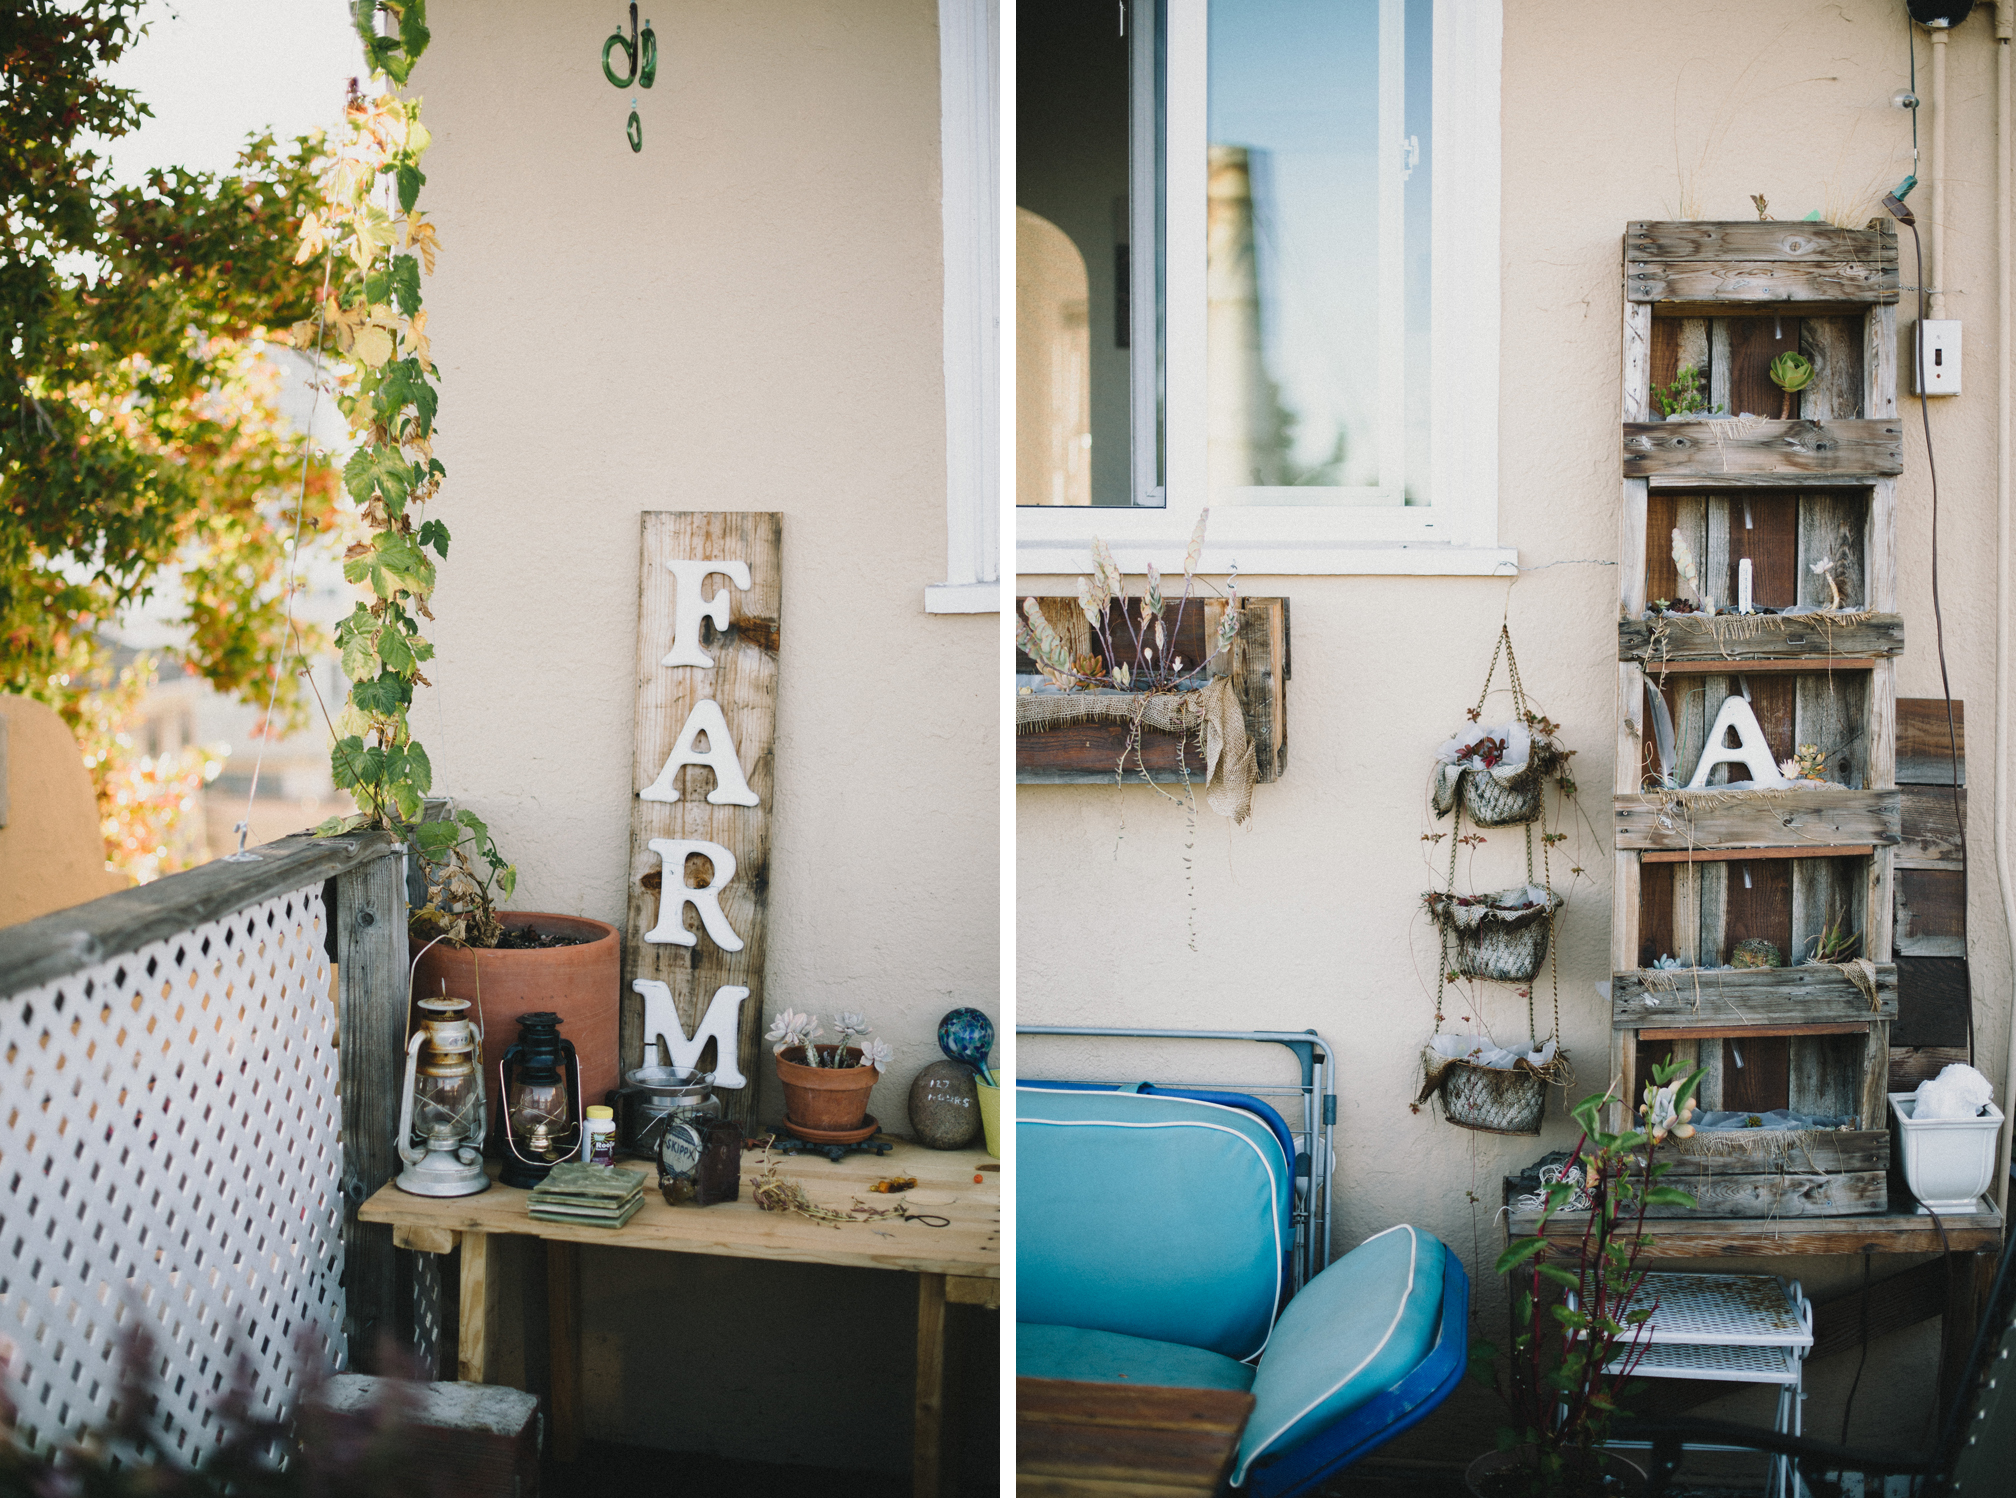 Farm sign rooftop garden  | The Honest Home | Jared Tharp | Loveridge Photography